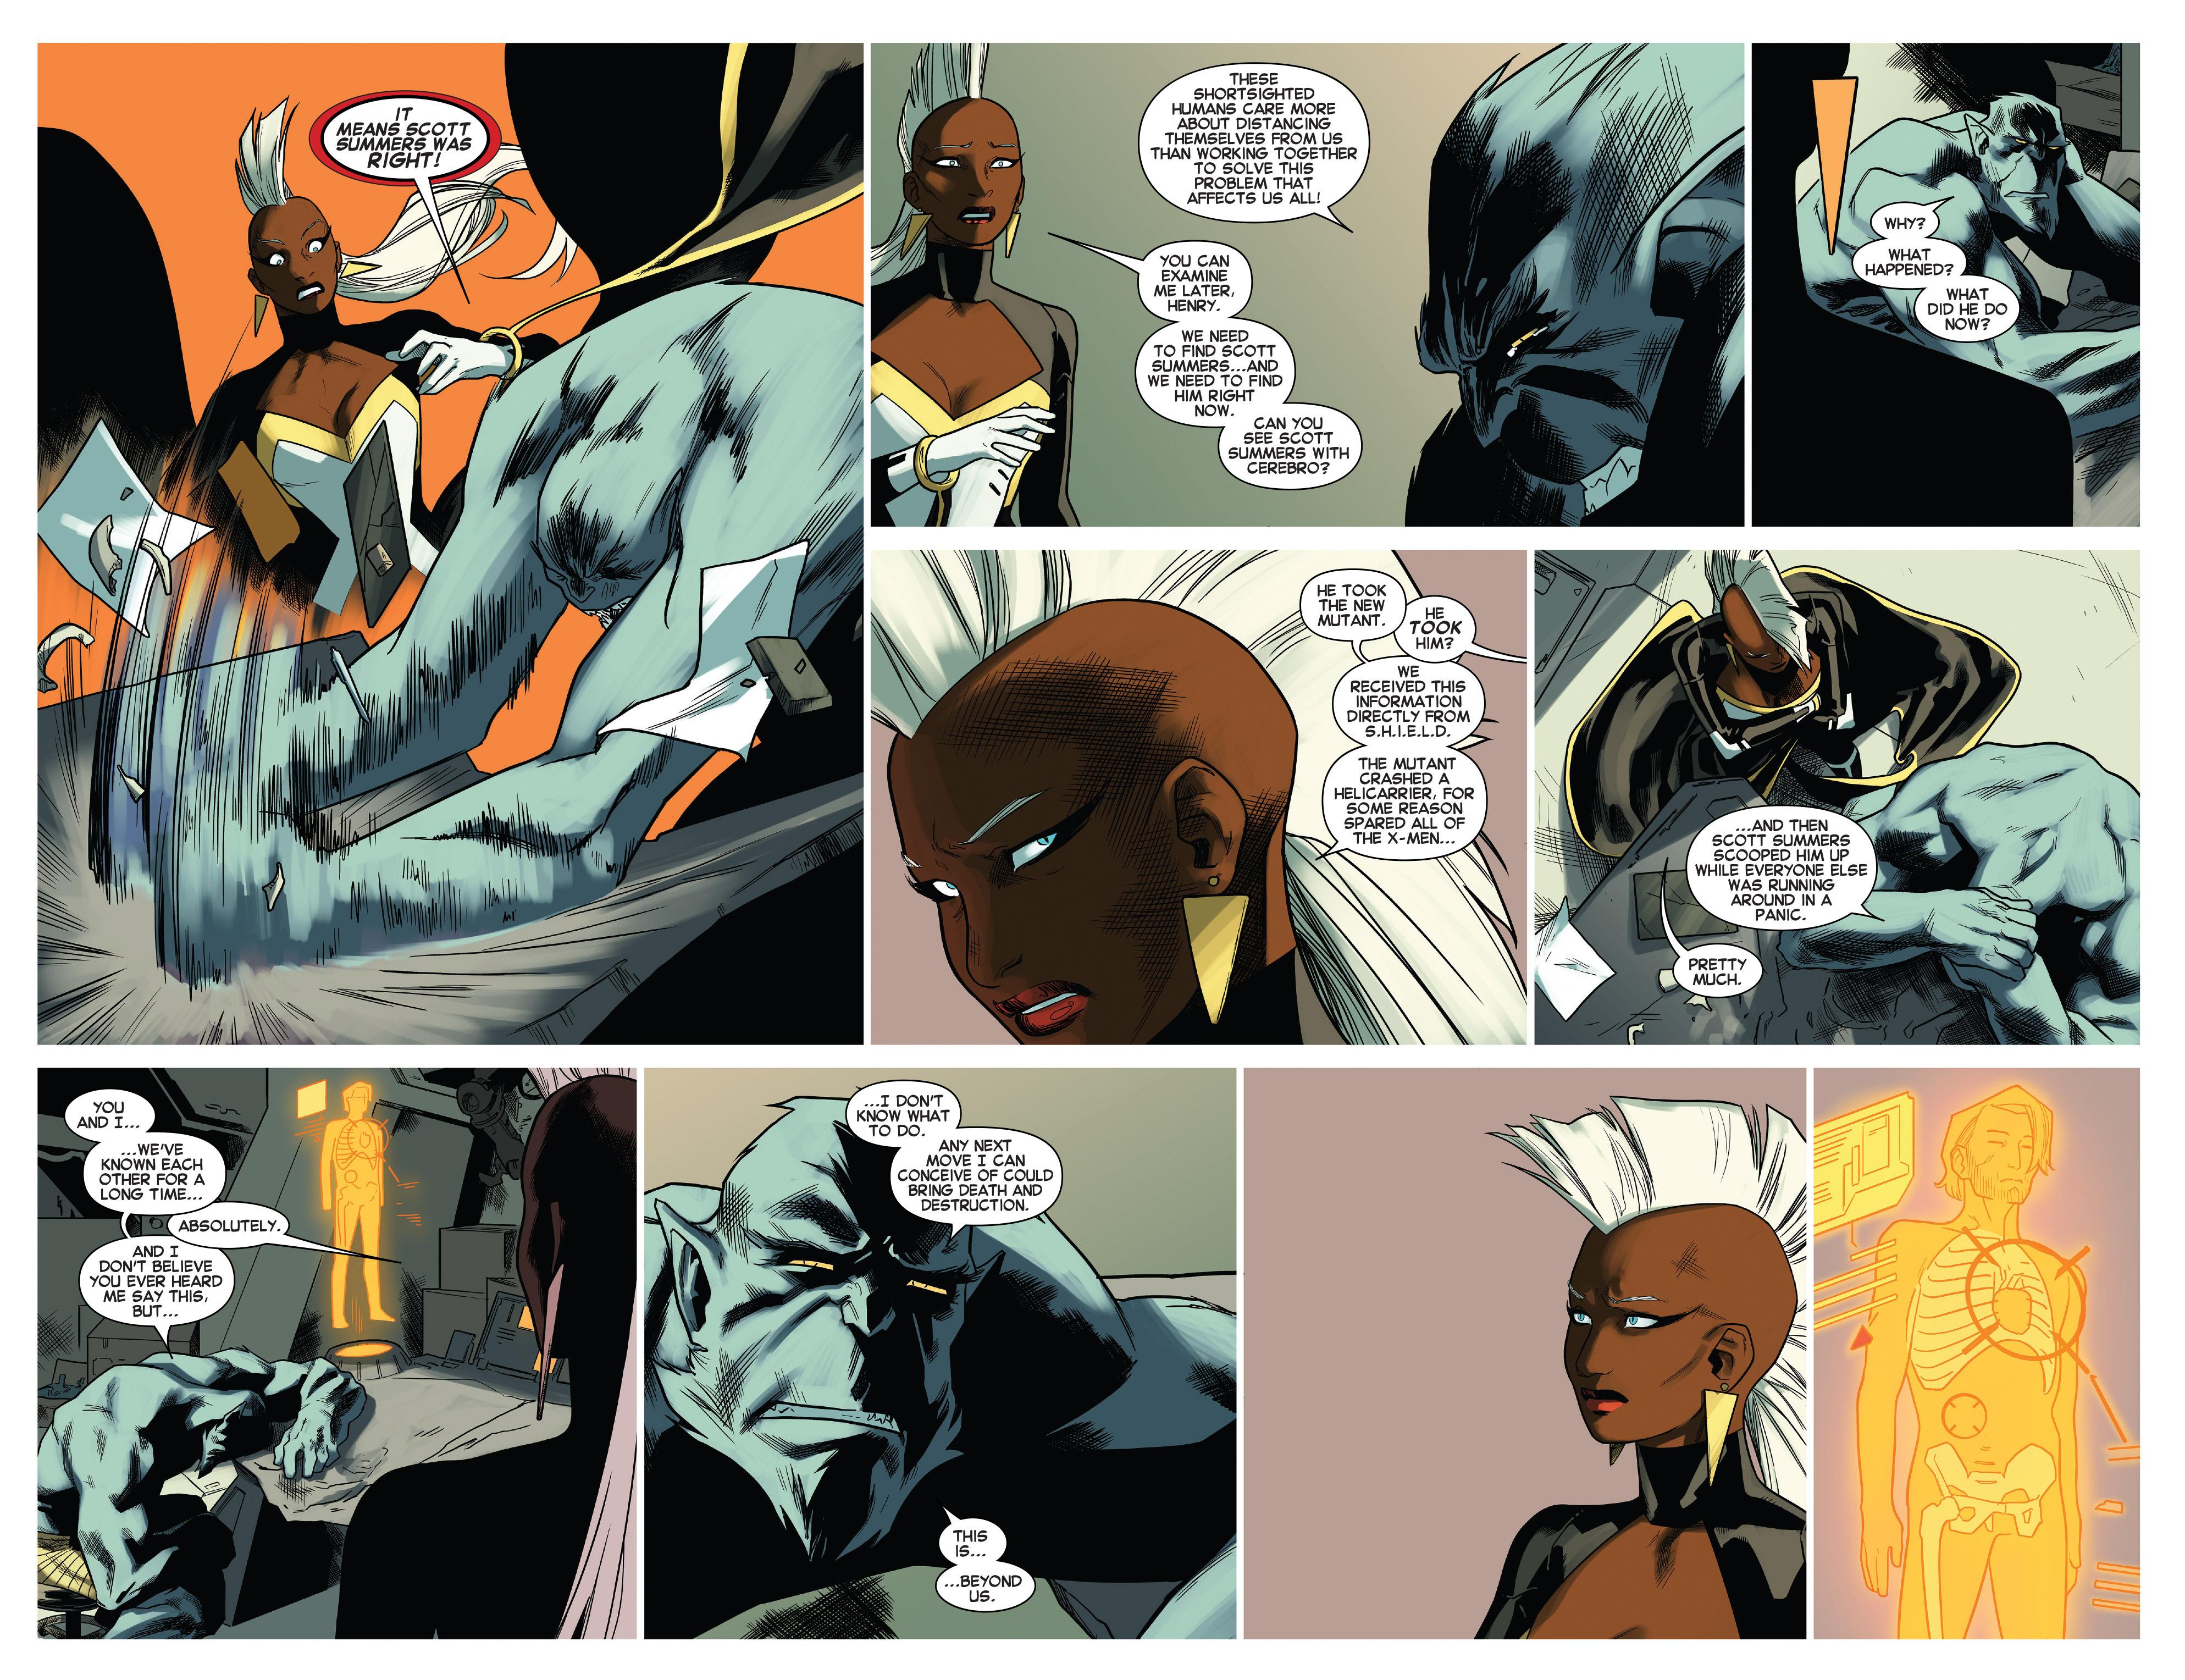 Read online Uncanny X-Men (2013) comic -  Issue # _TPB 5 - The Omega Mutant - 43